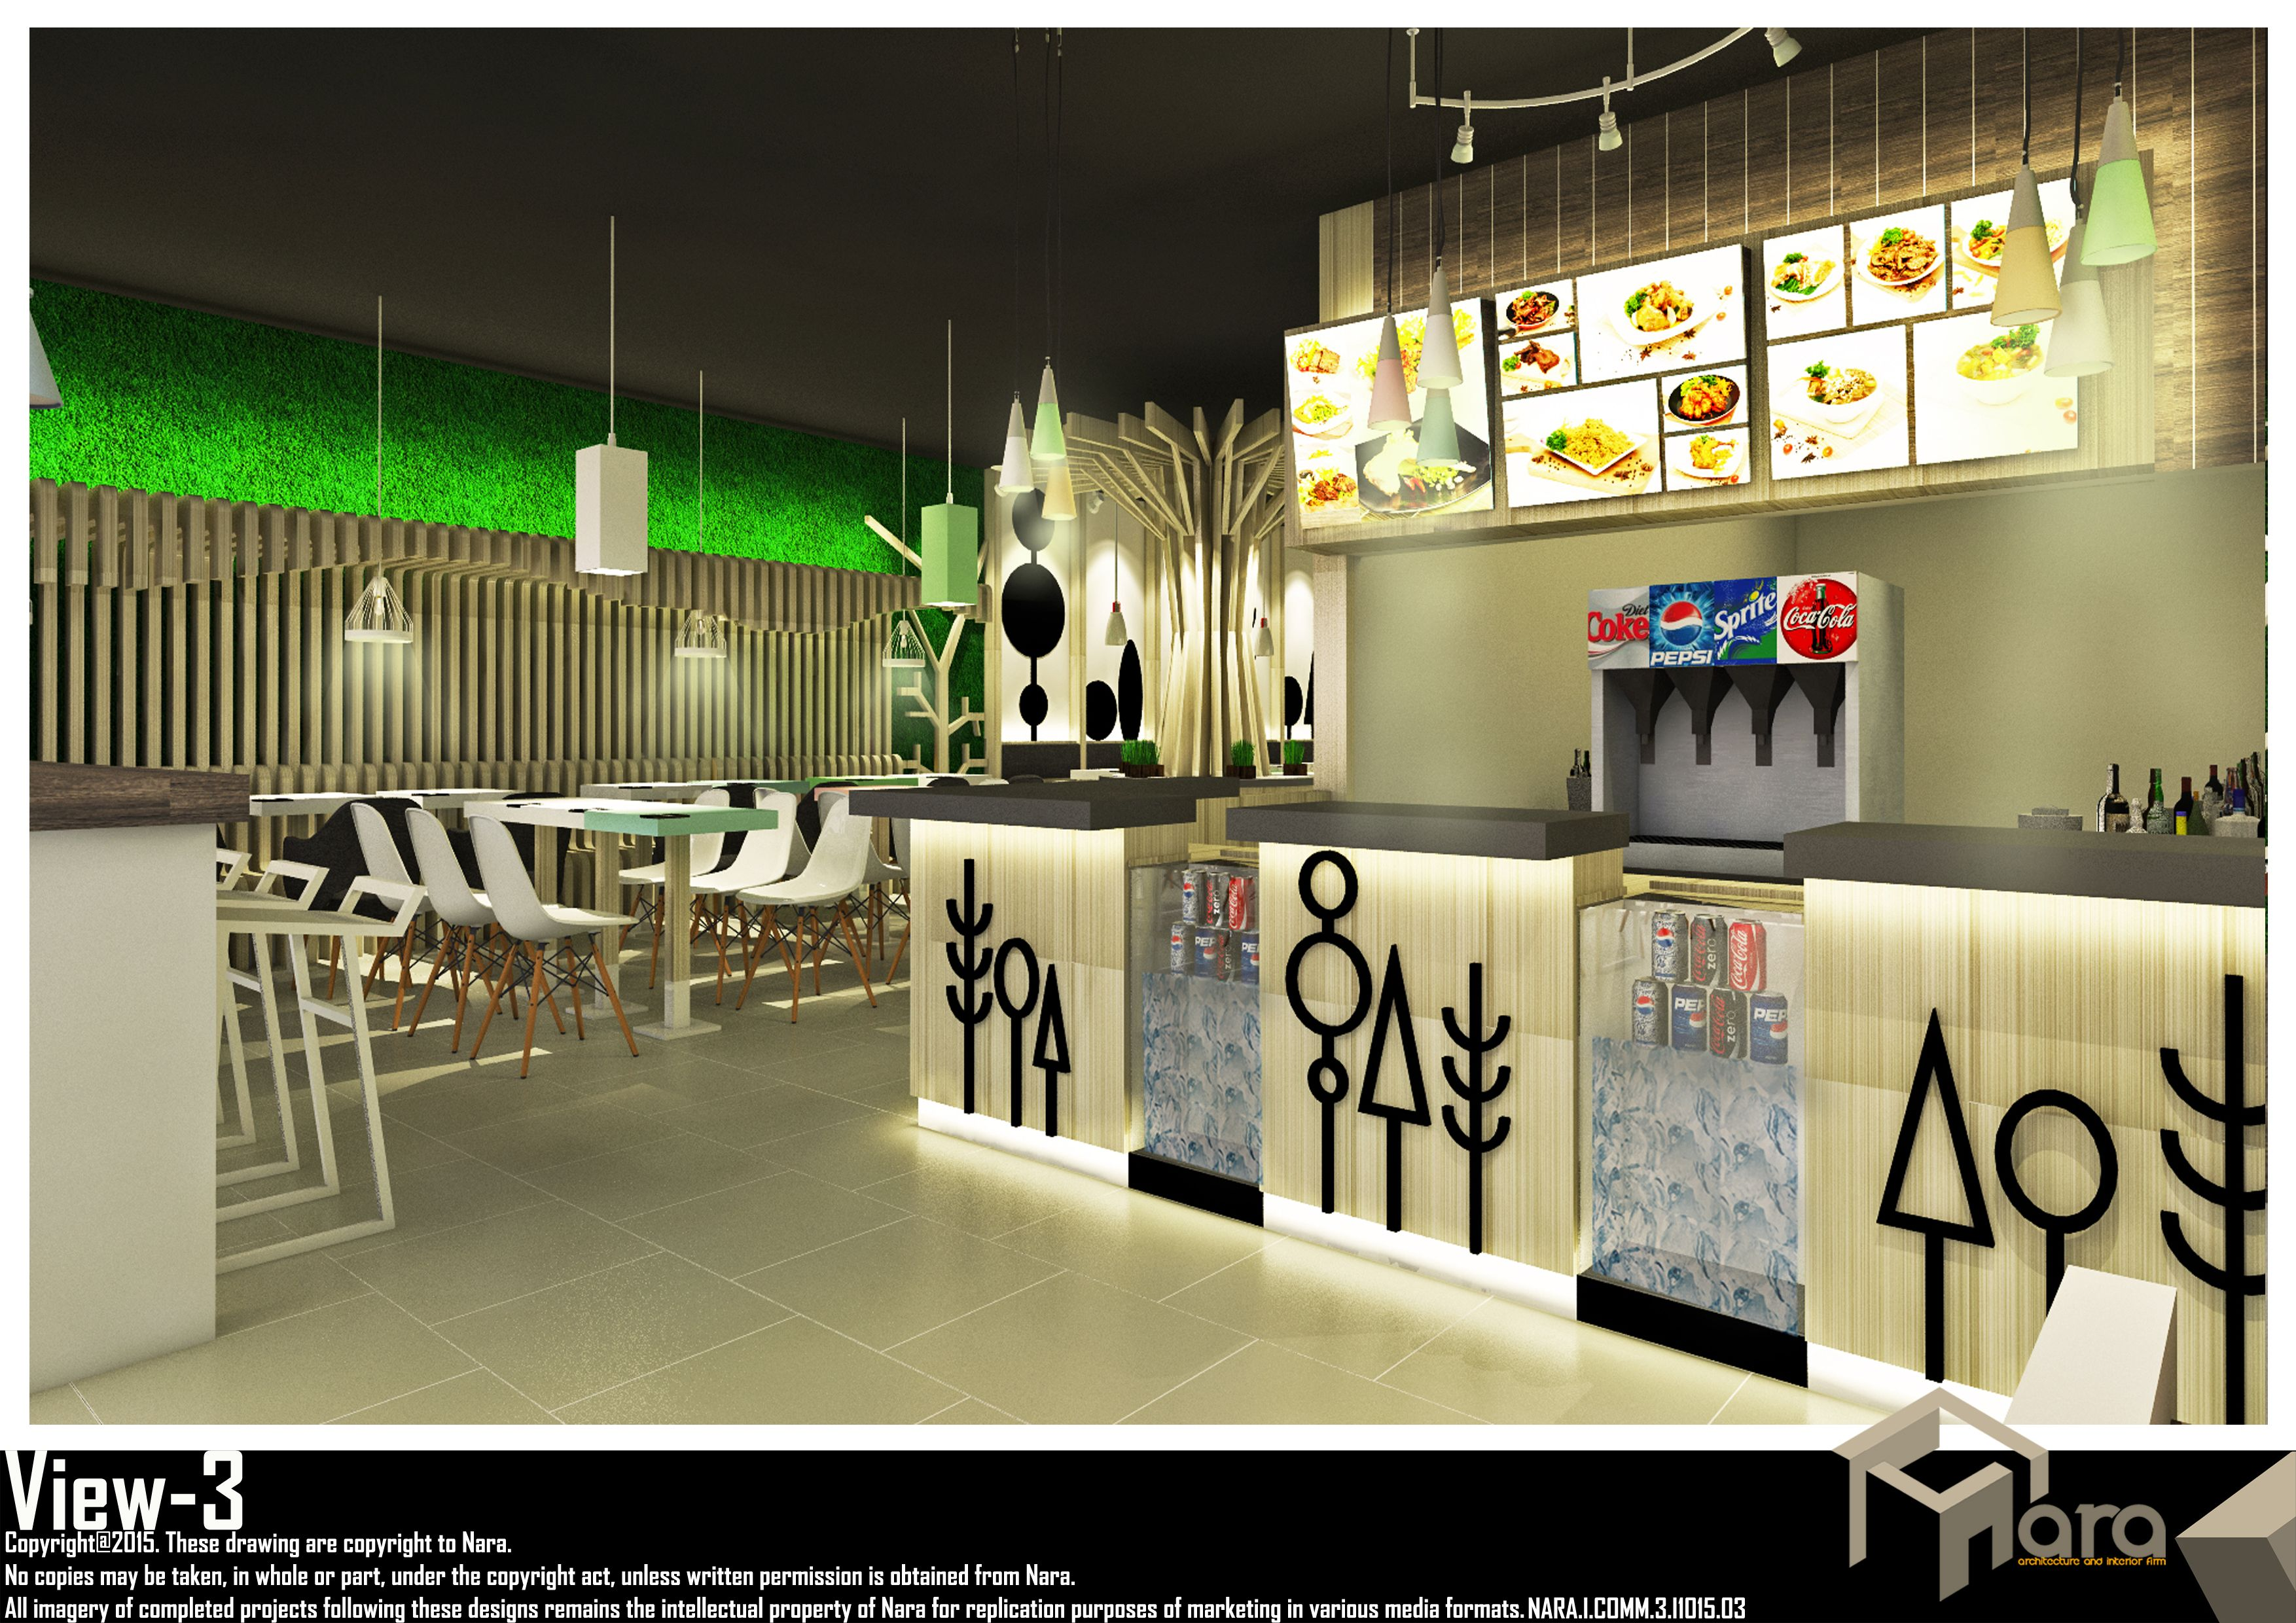 Interior Resto Raozen View - 3   nara.architects@gmail.com  